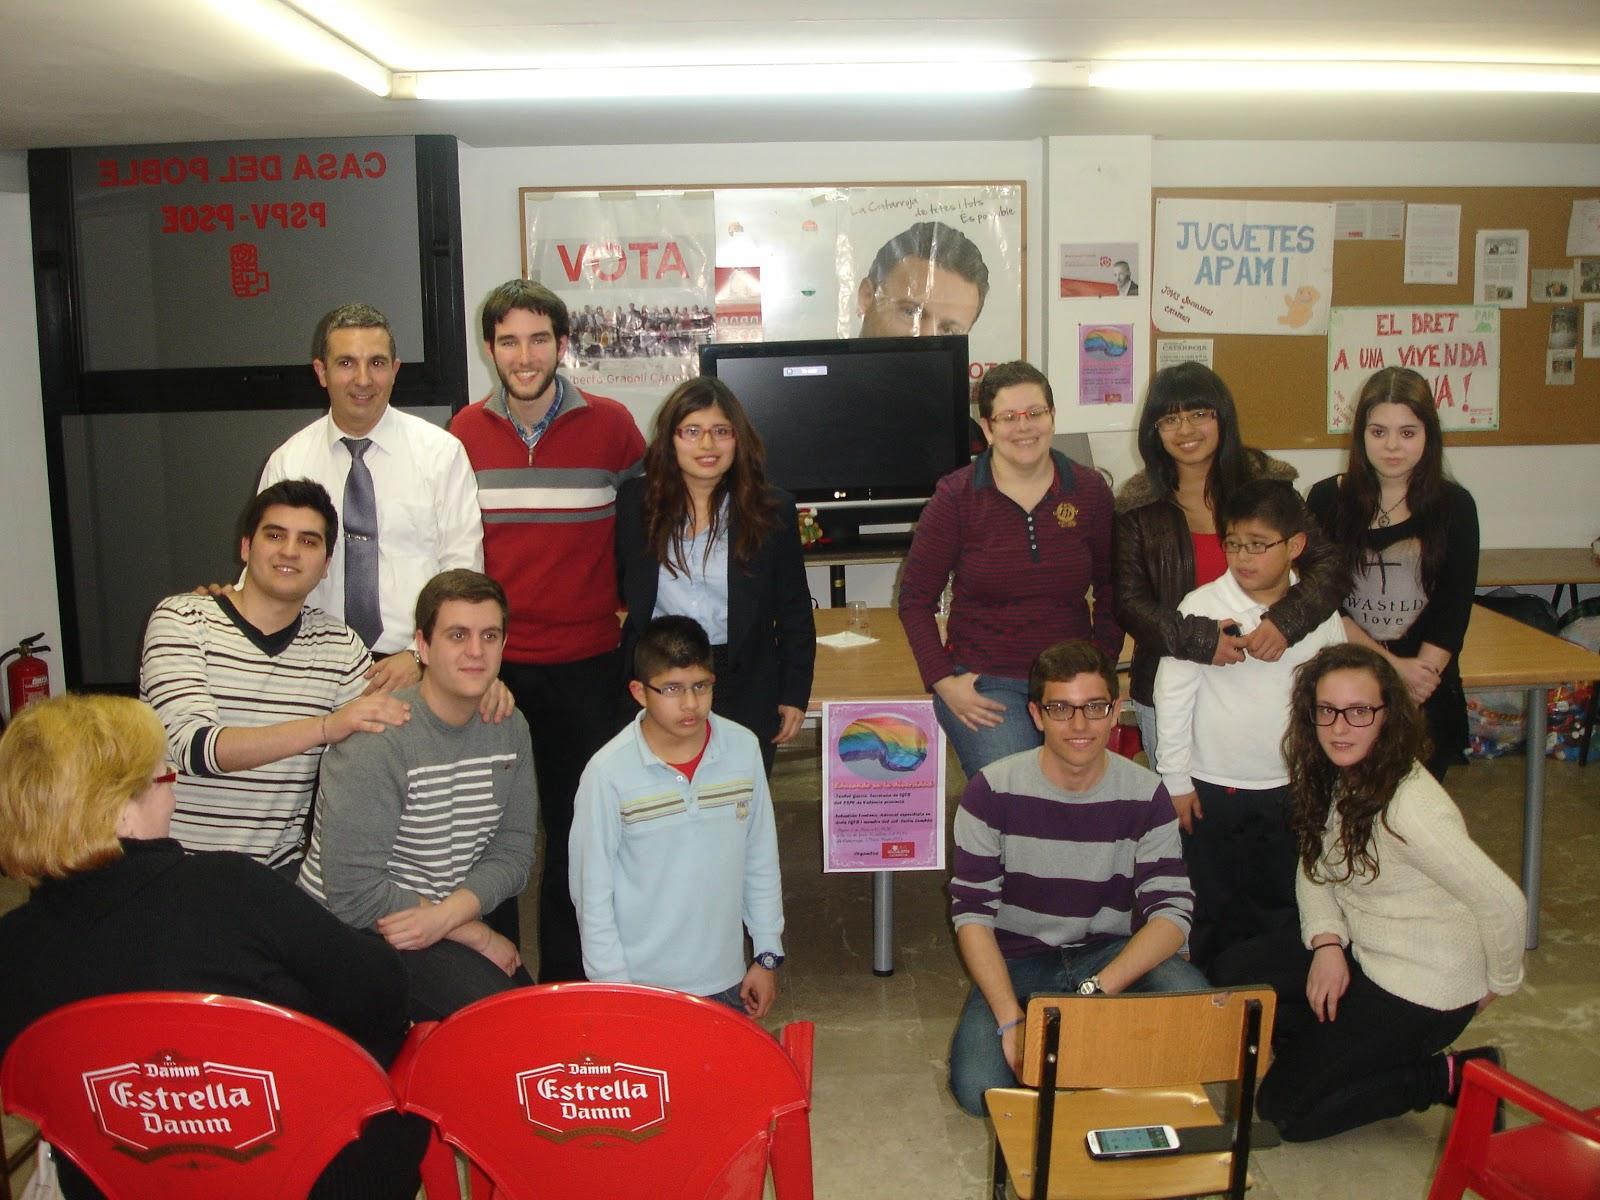 Joventuts socialistes de catarroja joves socialistes de - El tiempo en catarroja ...